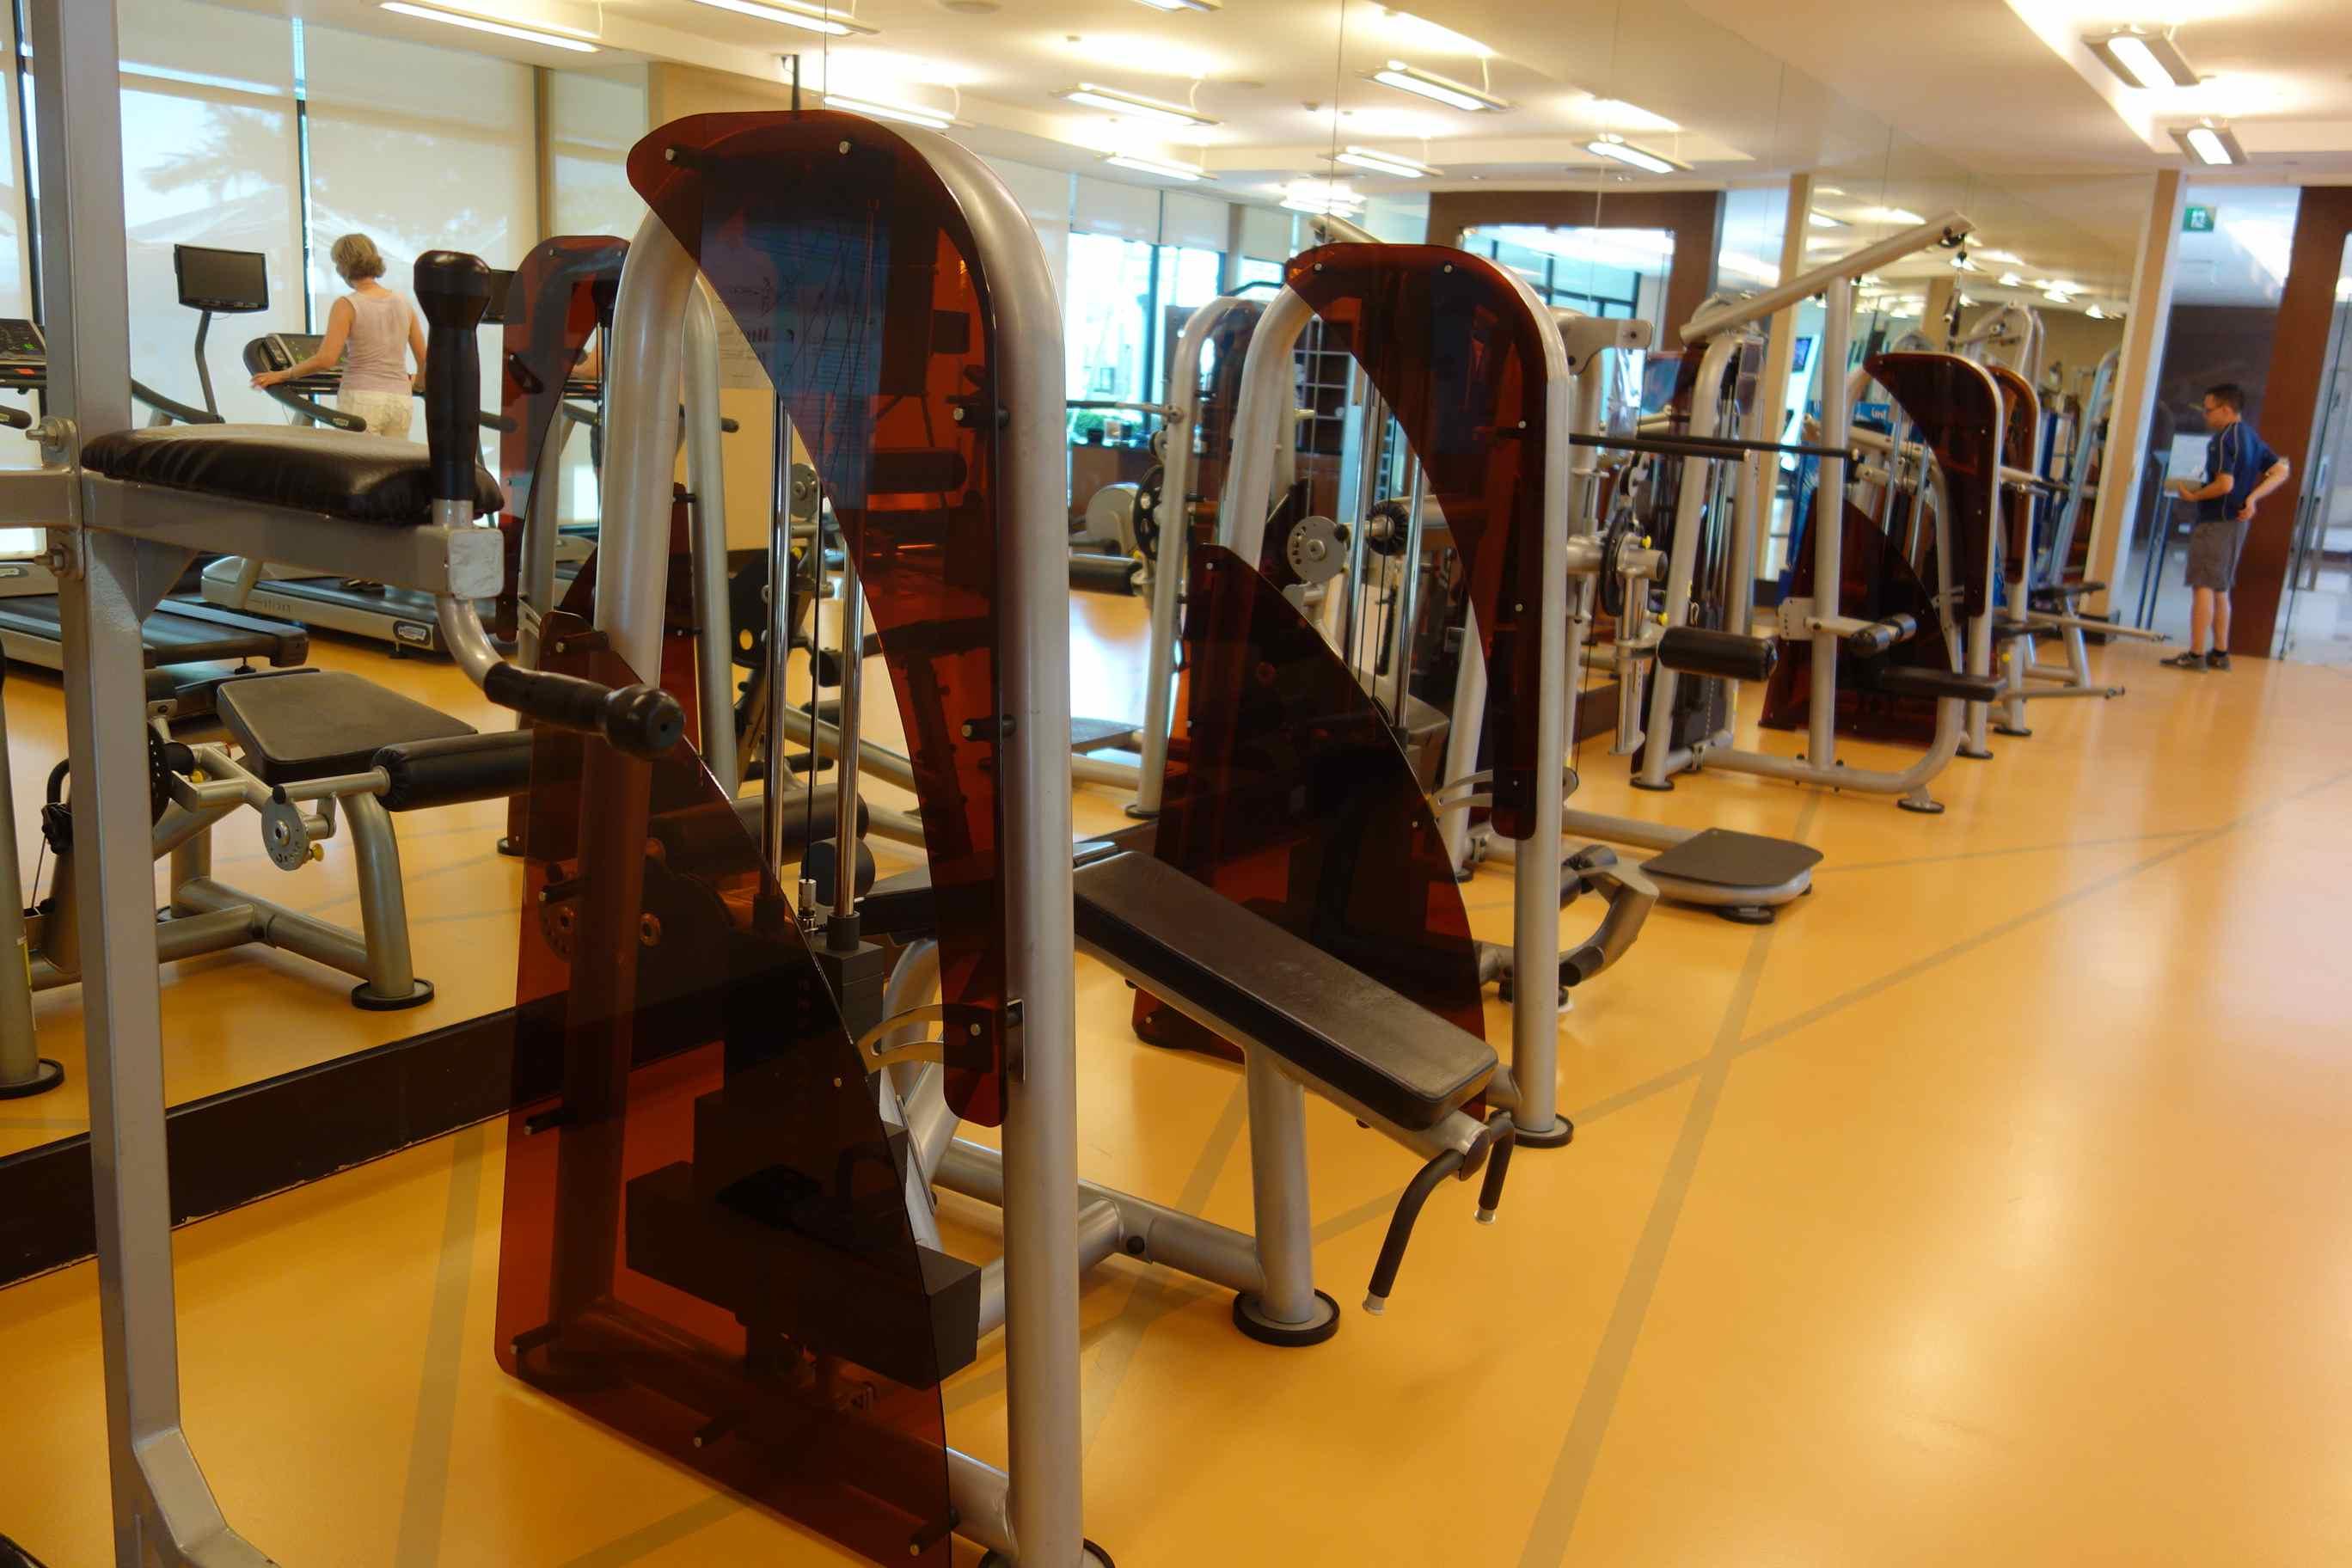 Gym equipment part 2